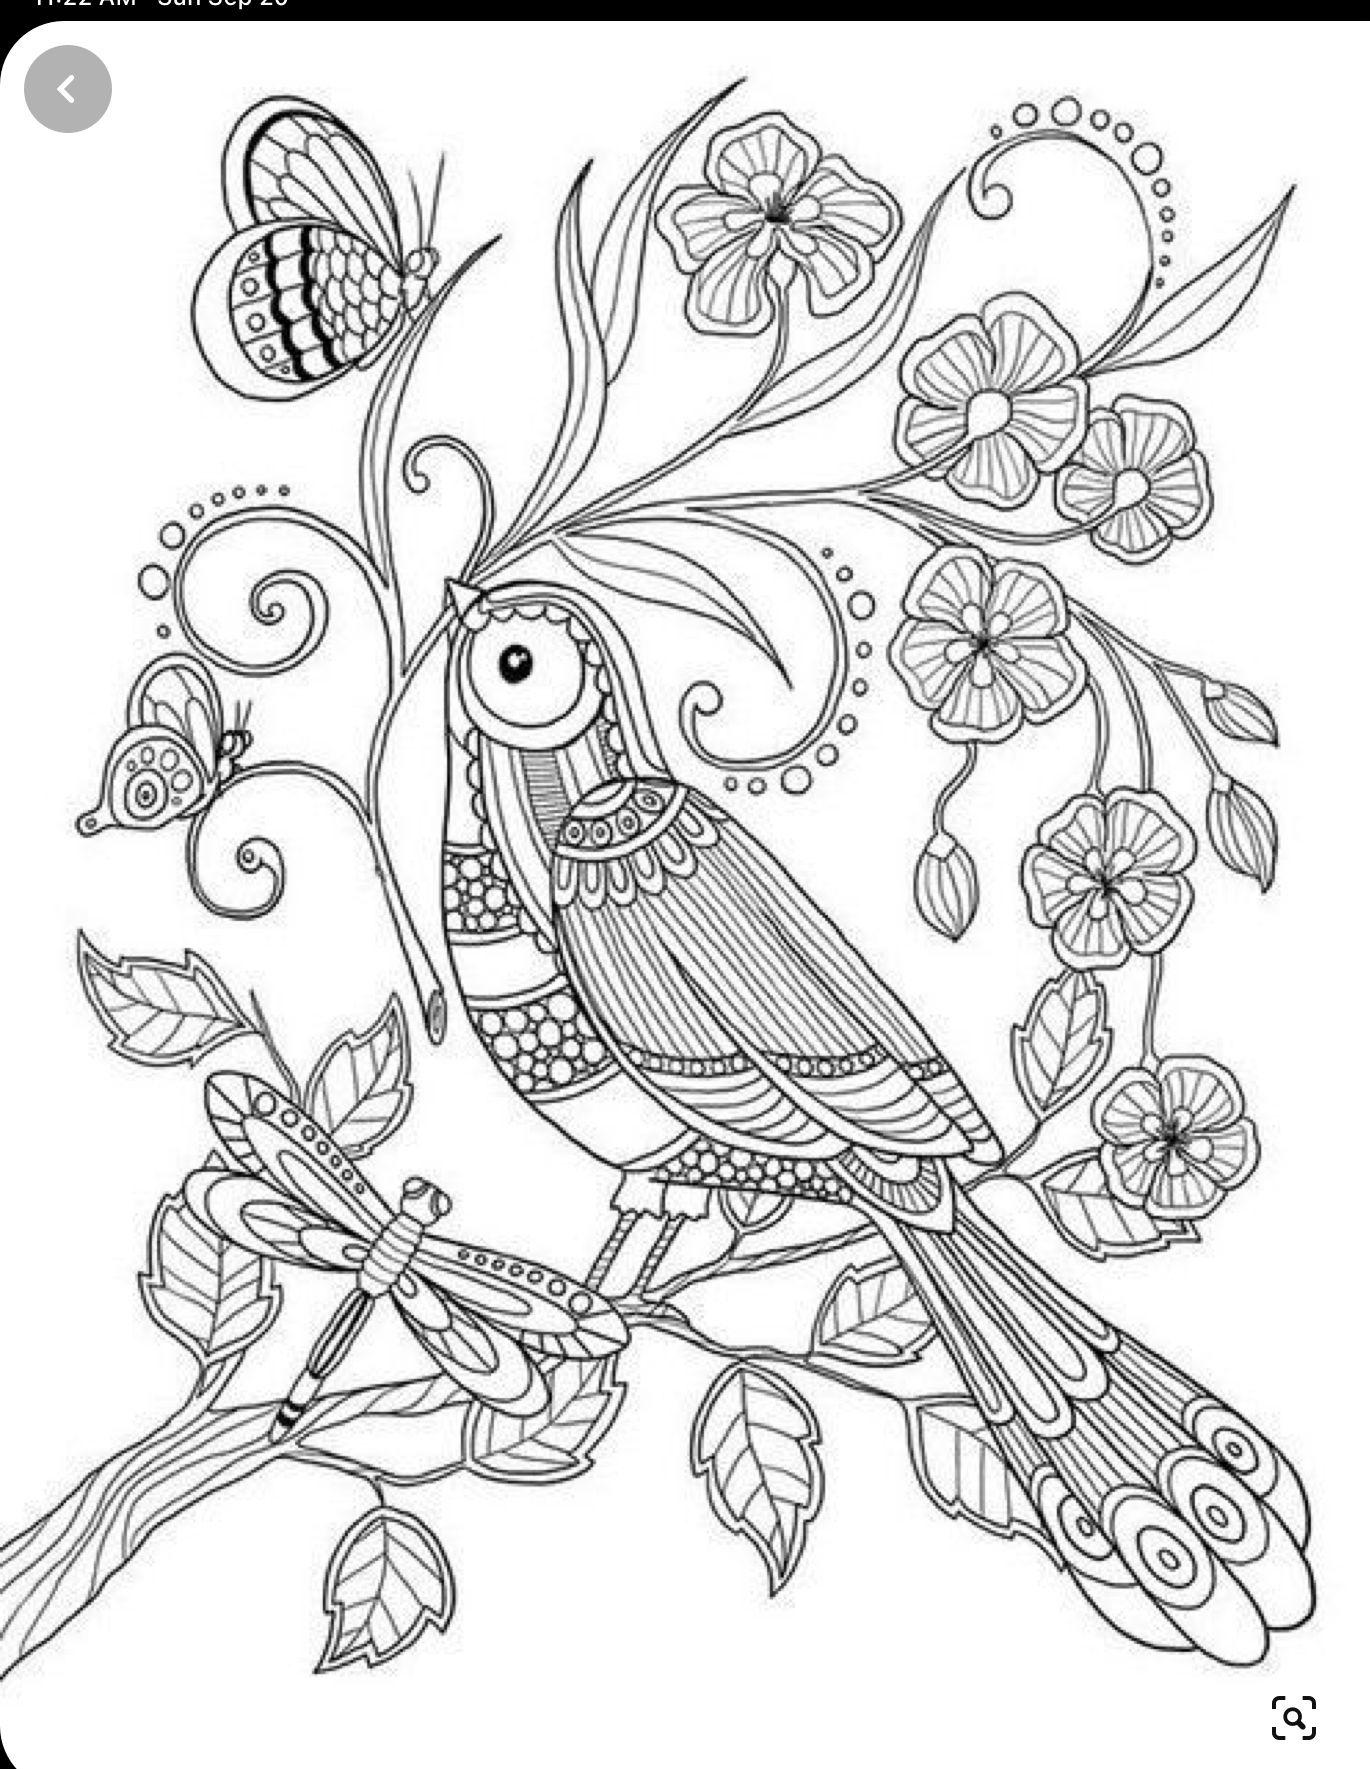 Pin Van Hanene Essayem Op Inspiration Of Prints Ideas Mandala Kleurplaten Kleurboek Mandala Tekeningen